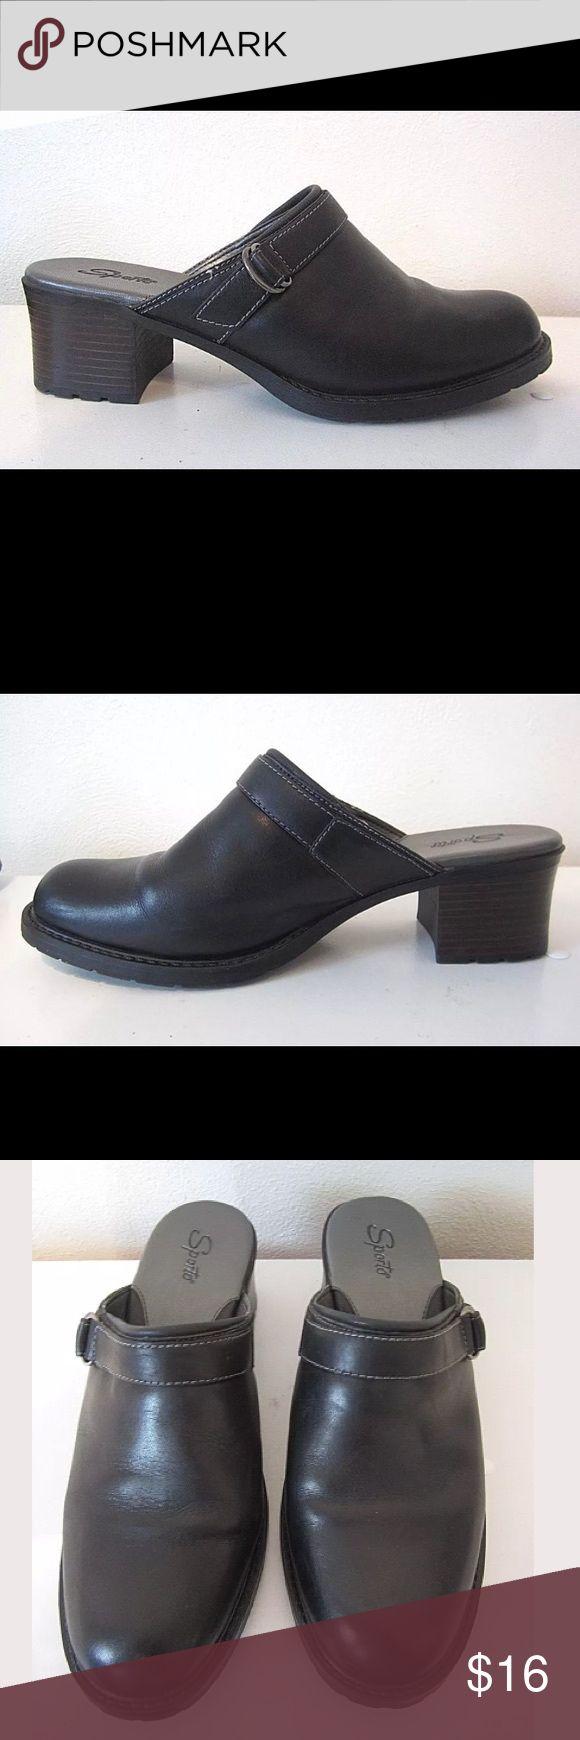 Sporto Black Leather Slip On Mules Clogs Heels 9M Sporto Black Leather Slip On Mules Clogs Heels Shoes 9M Sporto Shoes Mules & Clogs